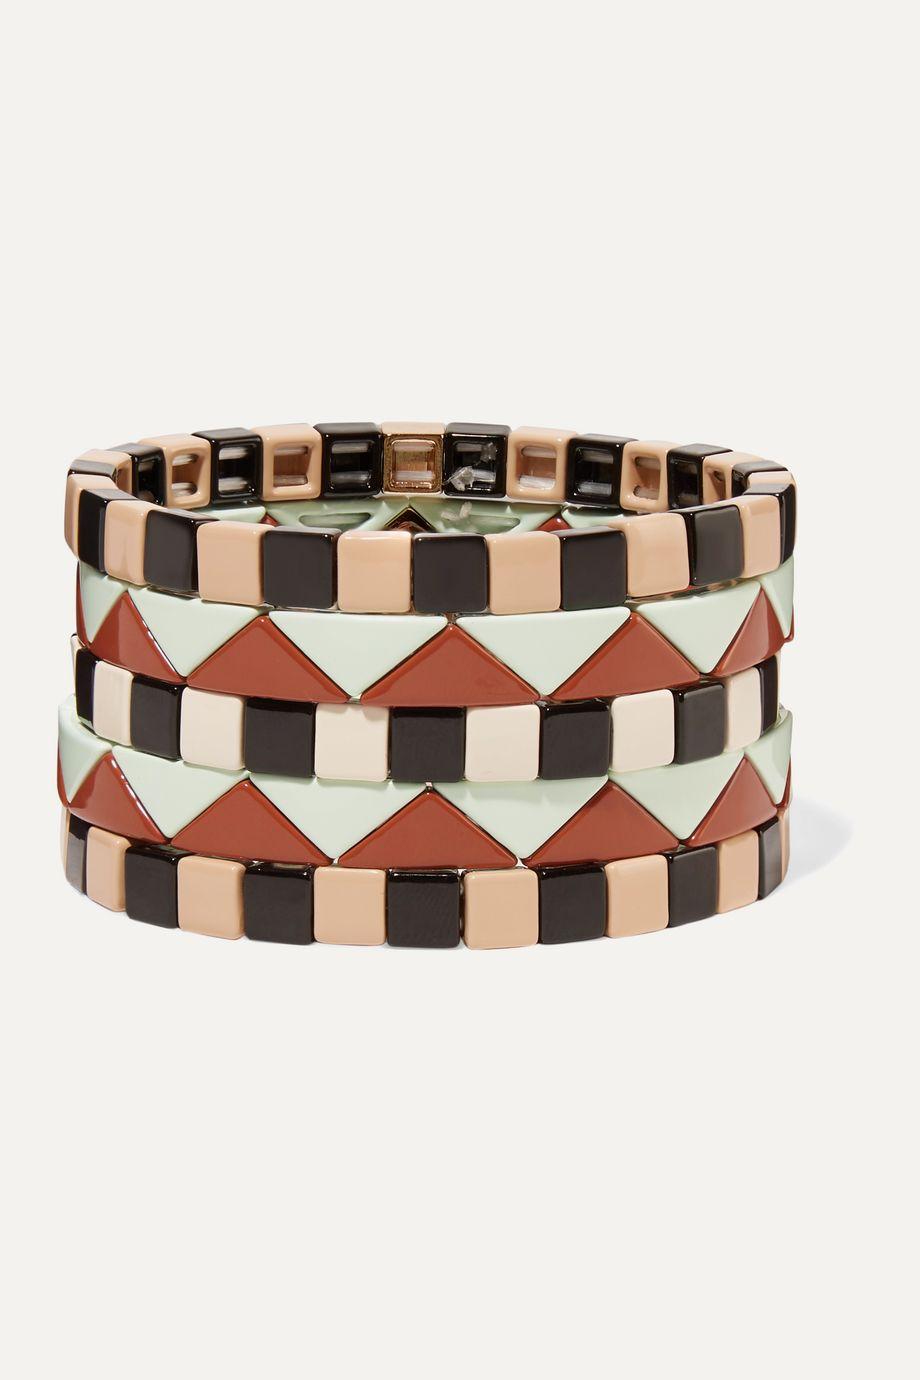 Roxanne Assoulin Mosaic 搪瓷手链(五条装)